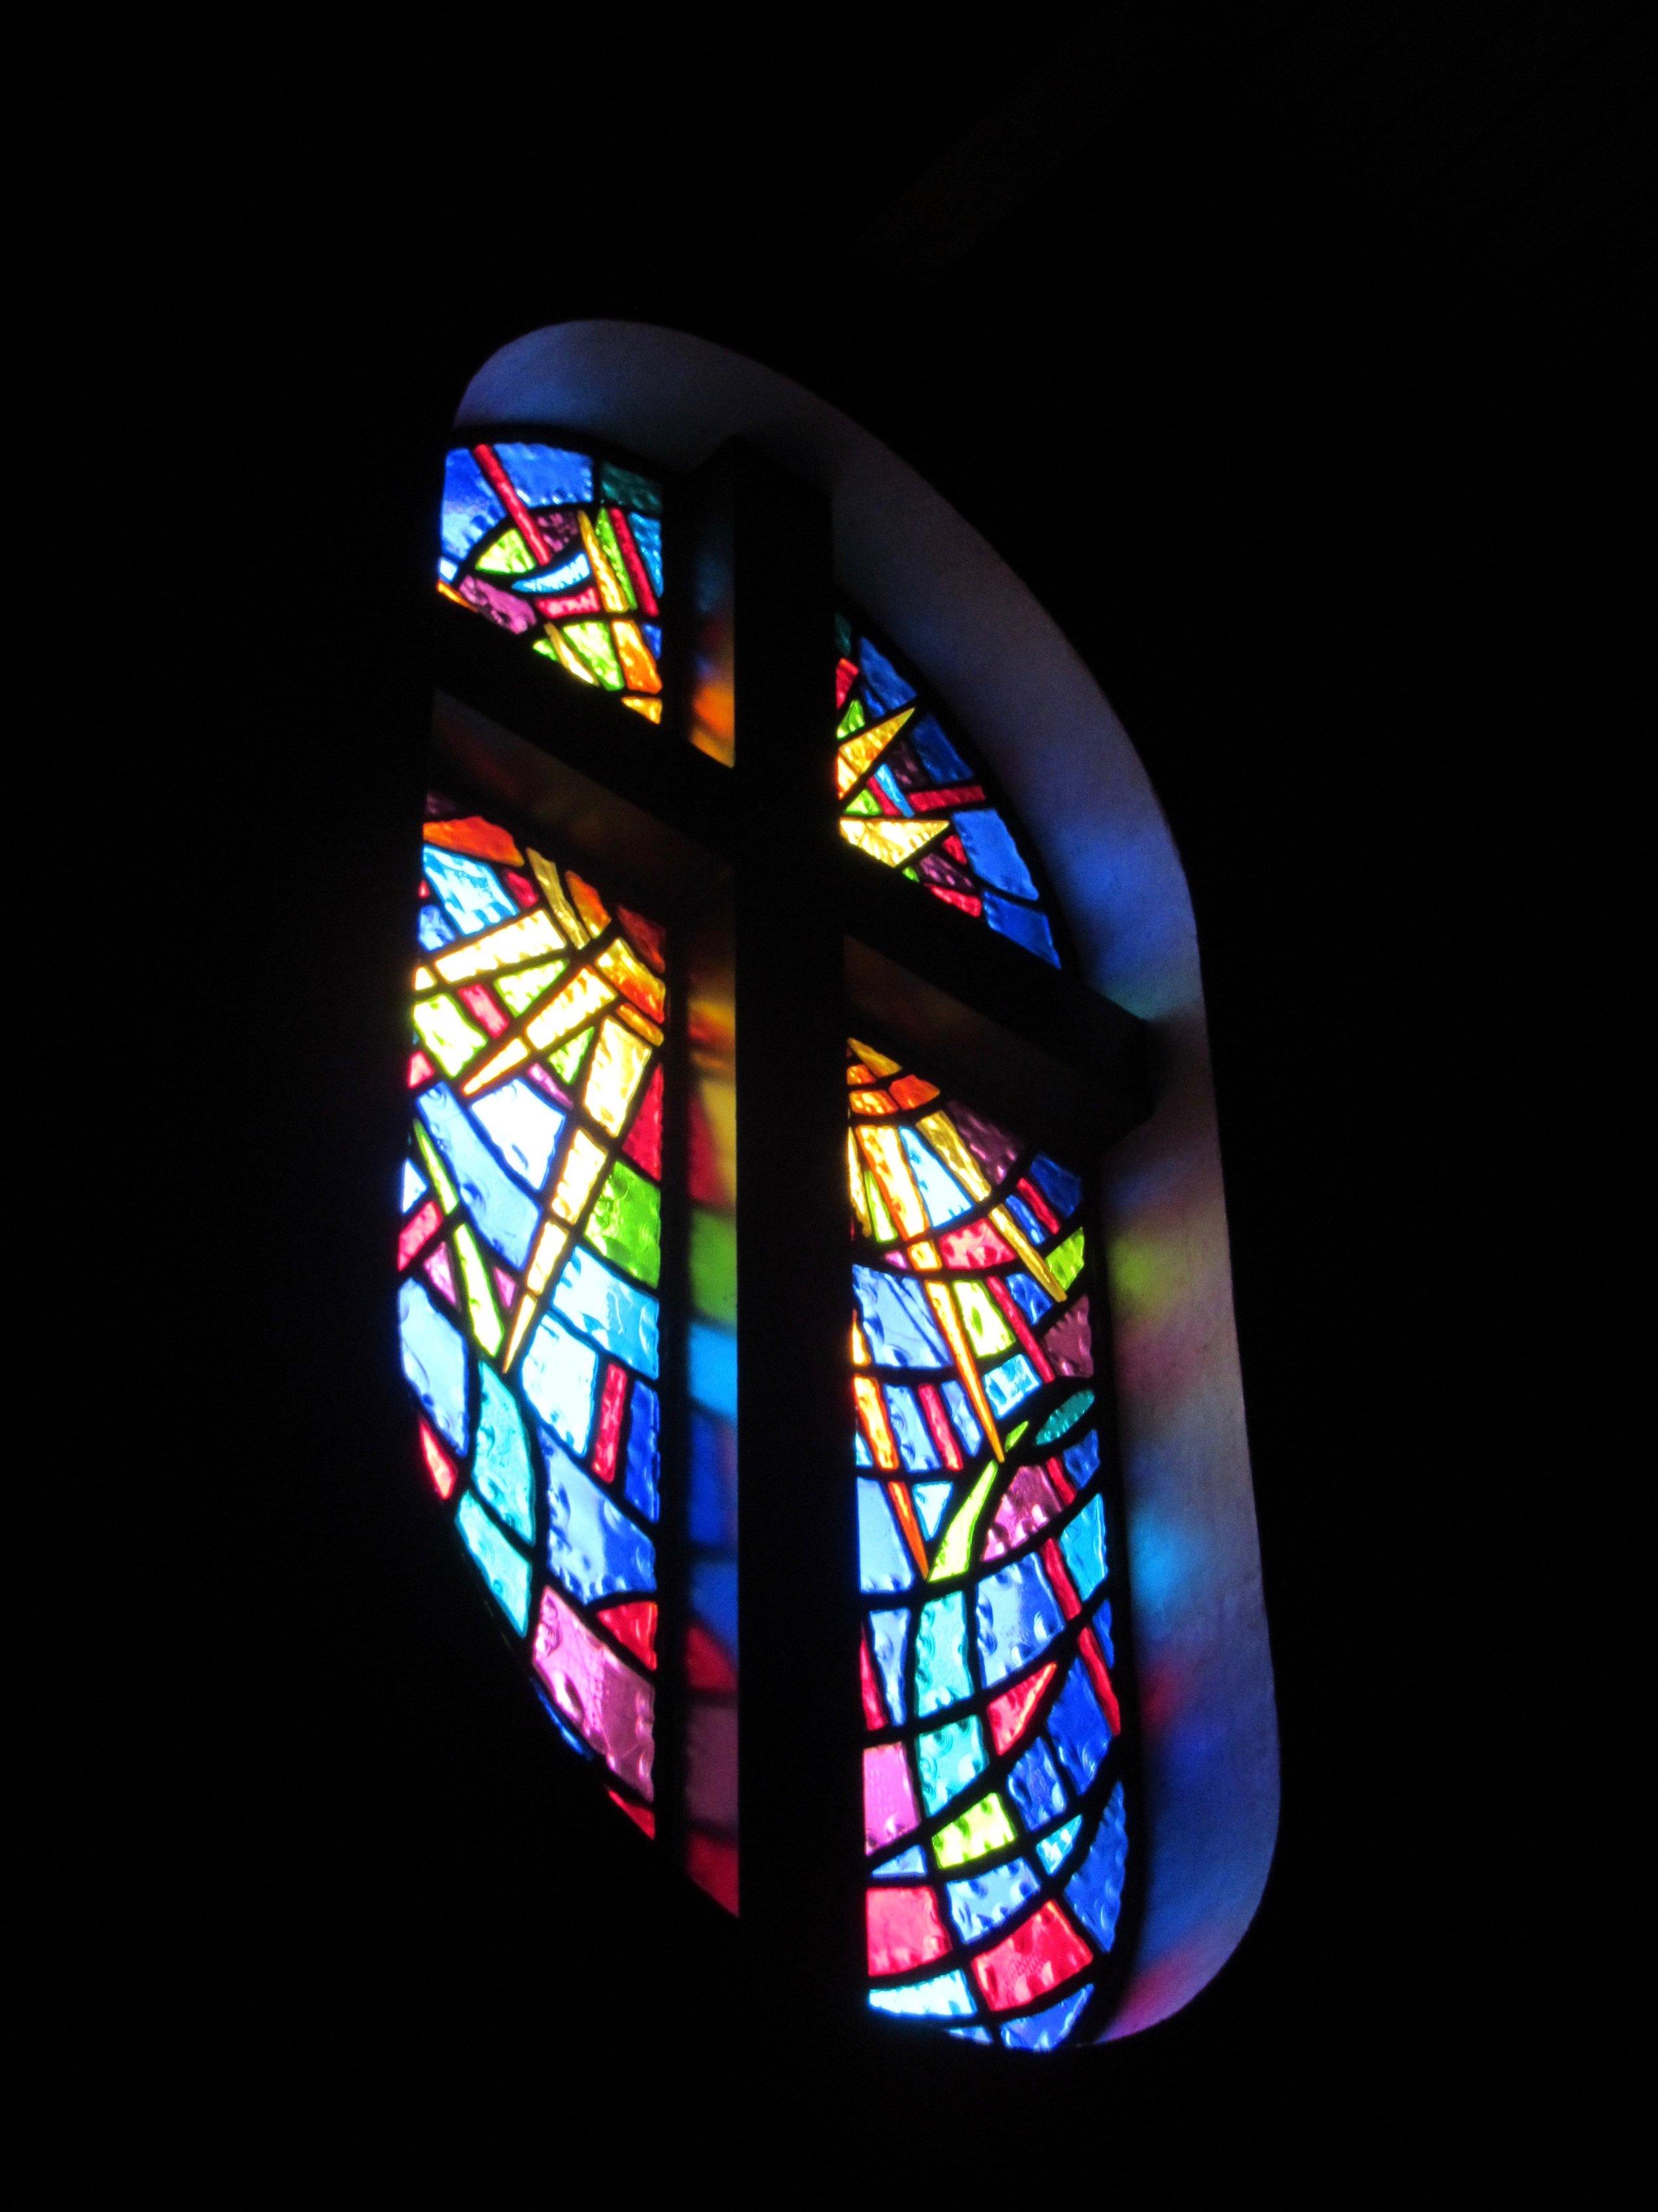 Focus of divine service online lutheran bible study bible